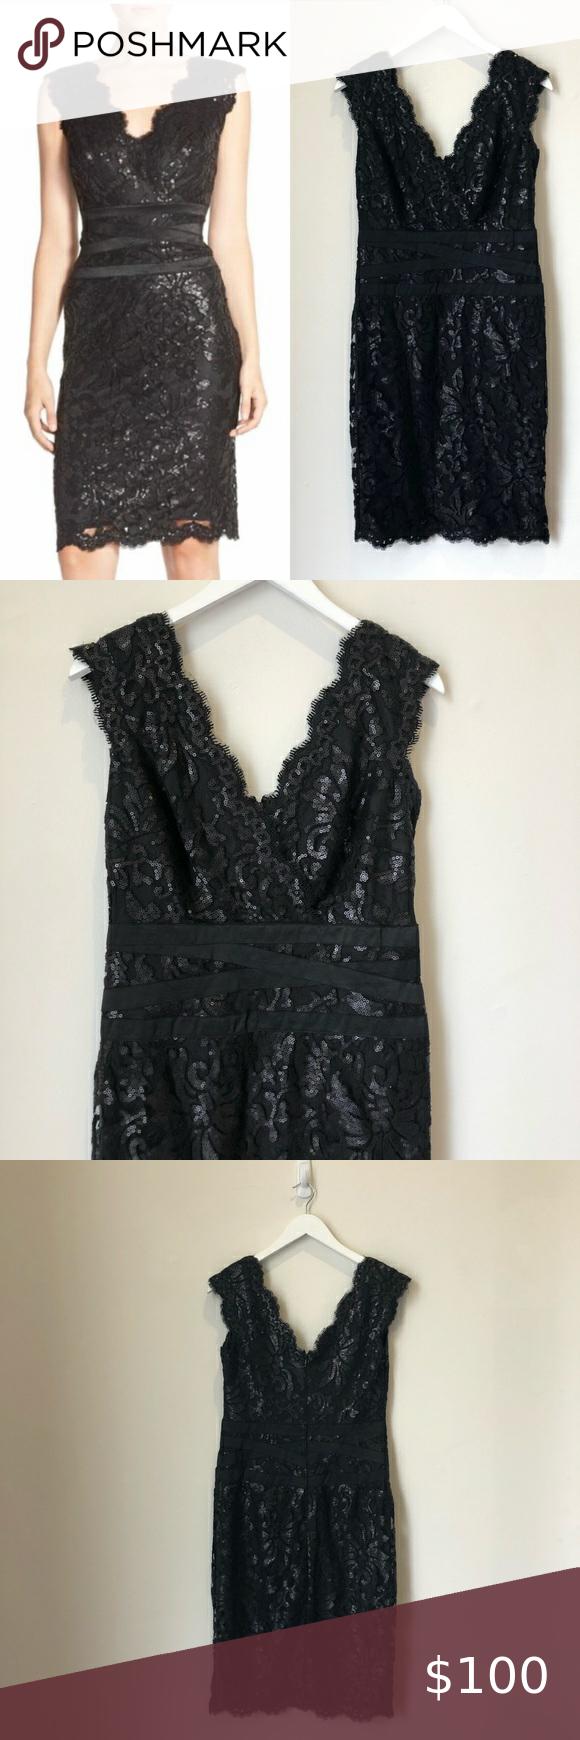 Tadashi Shoji Black Sequin Lace Embroidered Dress Tadashi Shoji Black Dress With Floral Embroidered Lac Embroidered Lace Dress Embroidered Dress Applique Dress [ 1740 x 580 Pixel ]